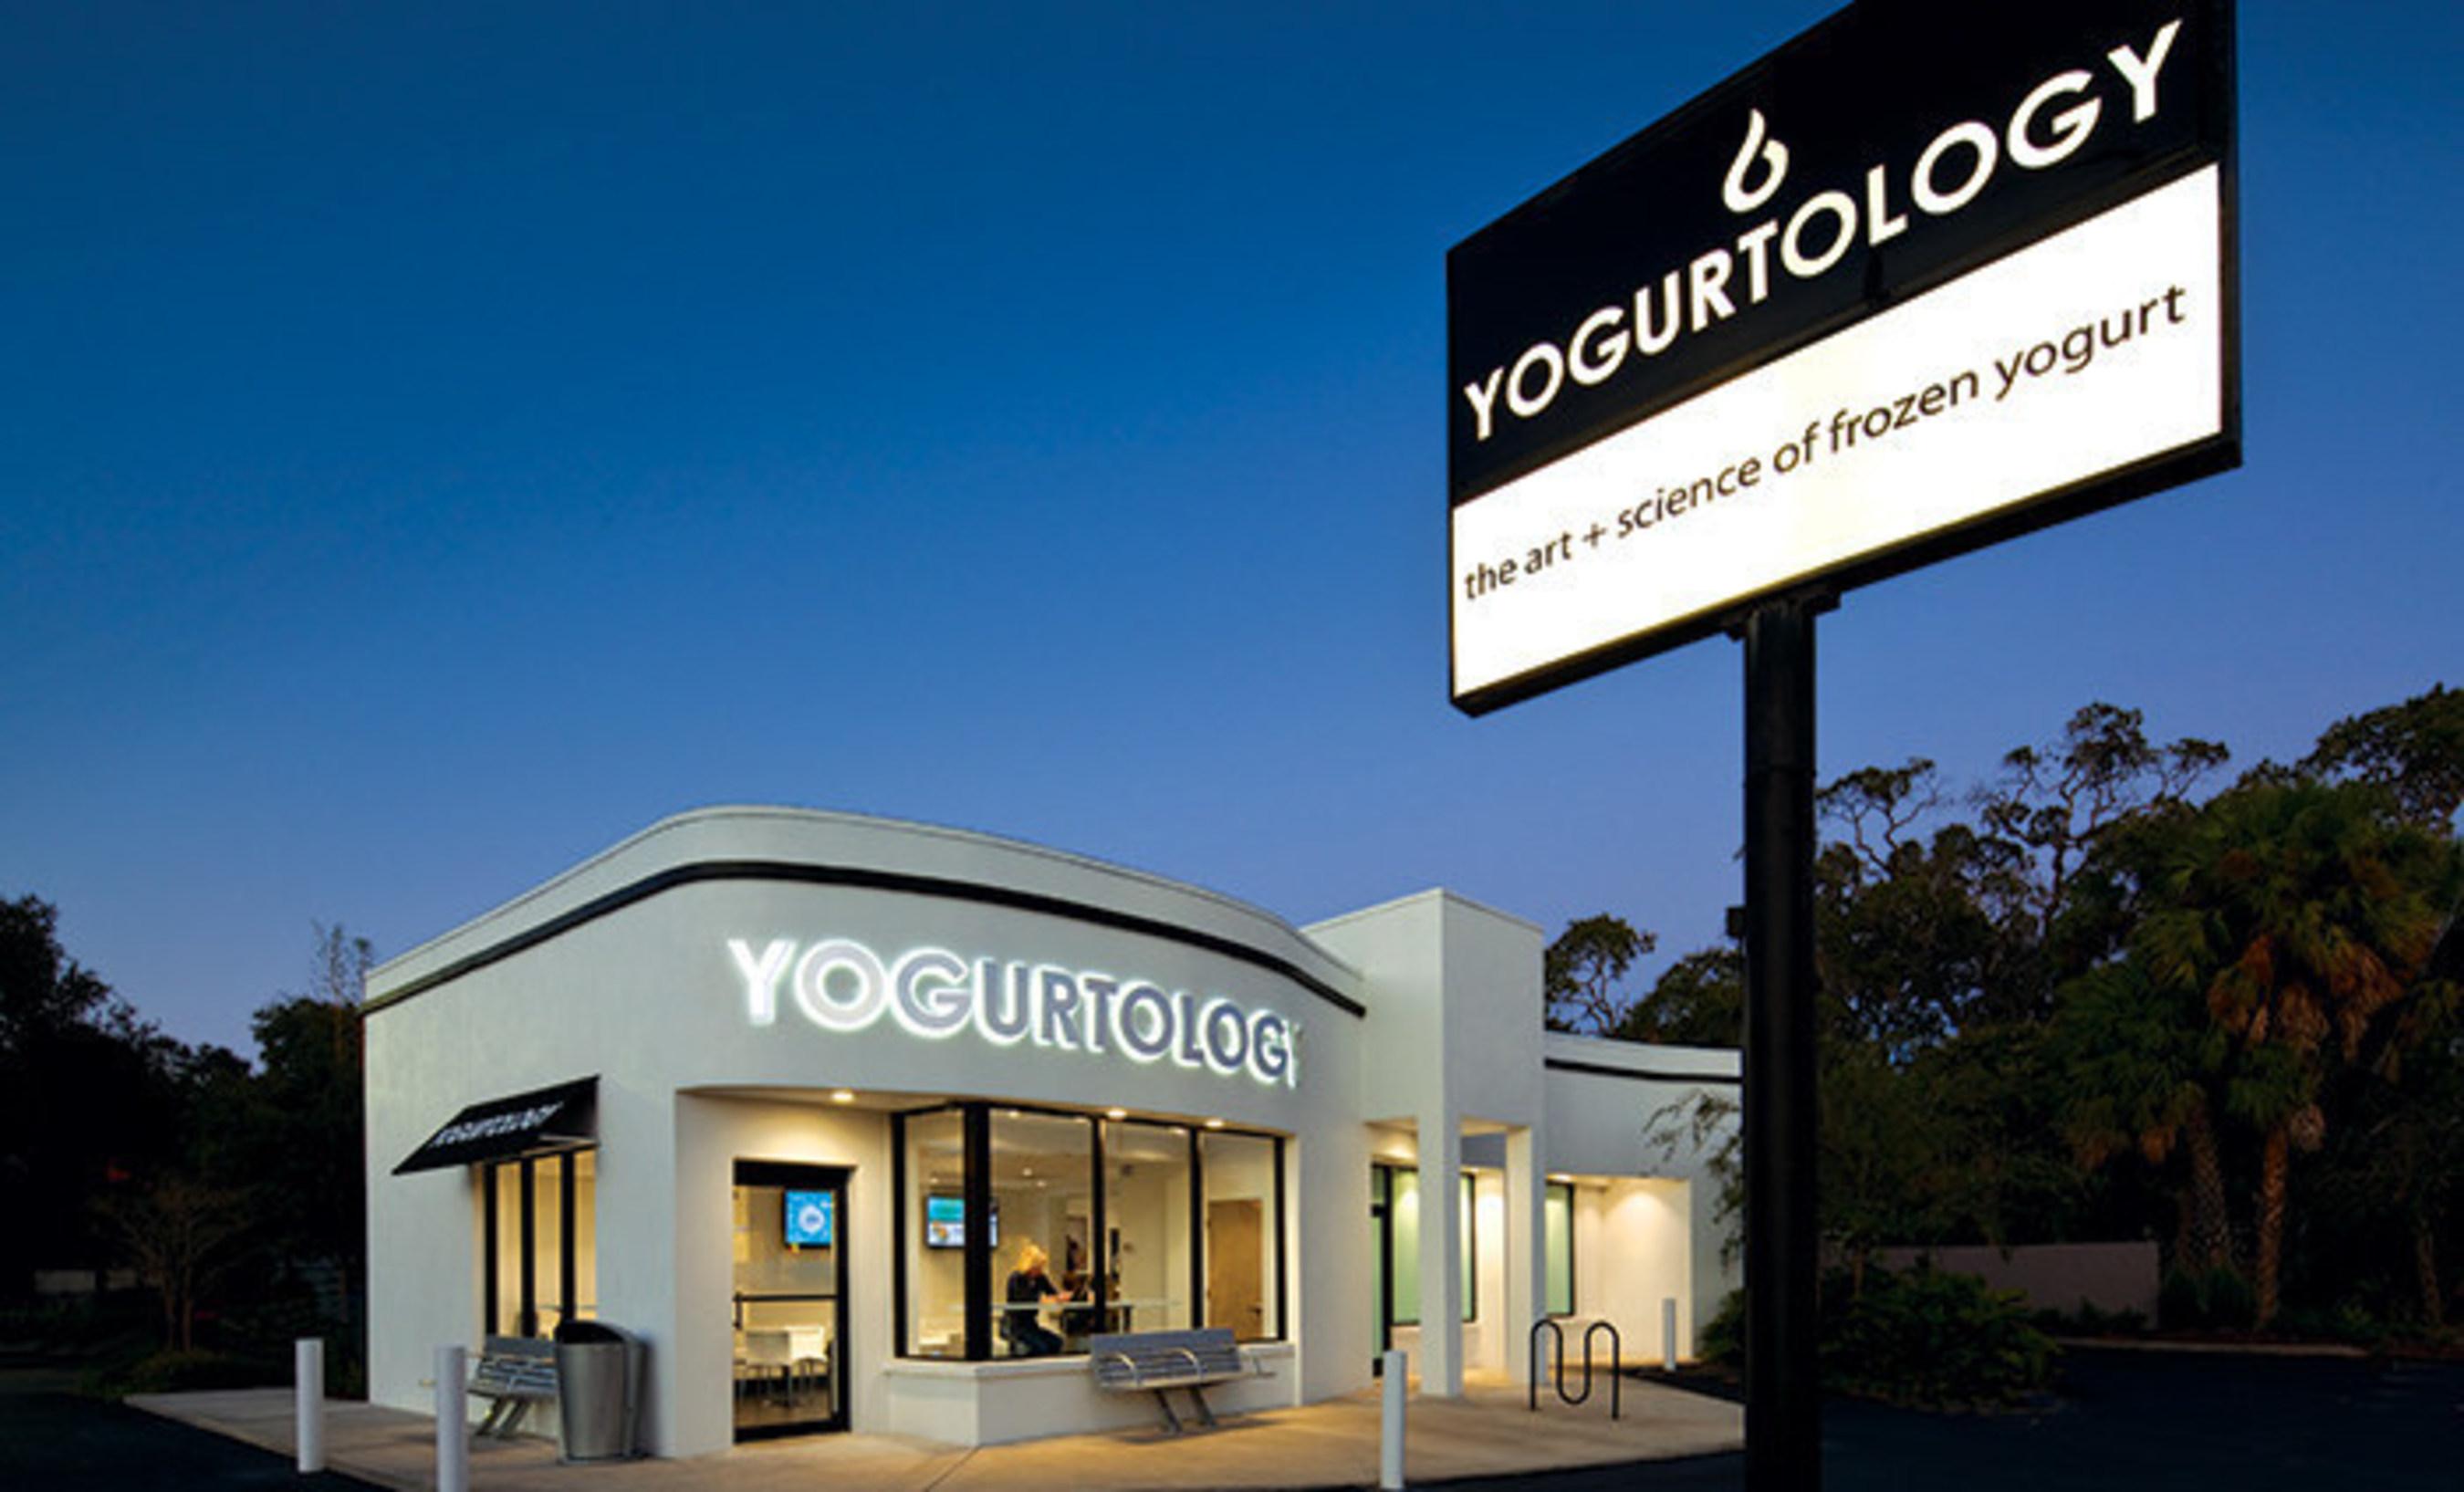 Yogurtology Celebrates Veteran's Day With Free Yogurt for Veterans and Active Military